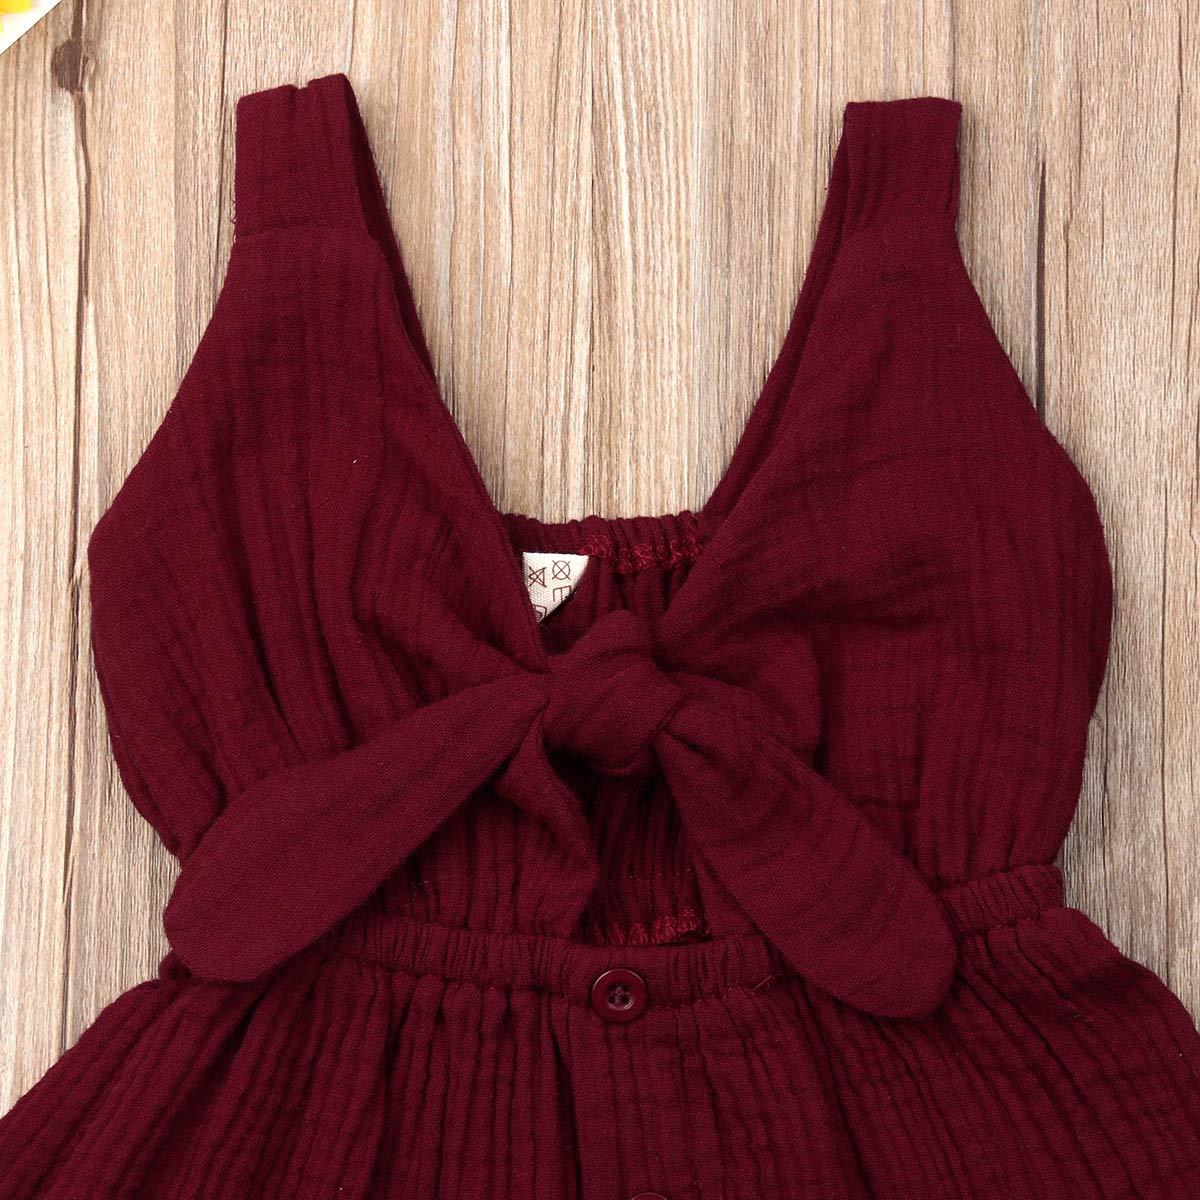 LUCKHA Baby Girl Summer V Neck Sleeveless Backless Tie Knot Cotton Linen Dress Casual Sundress